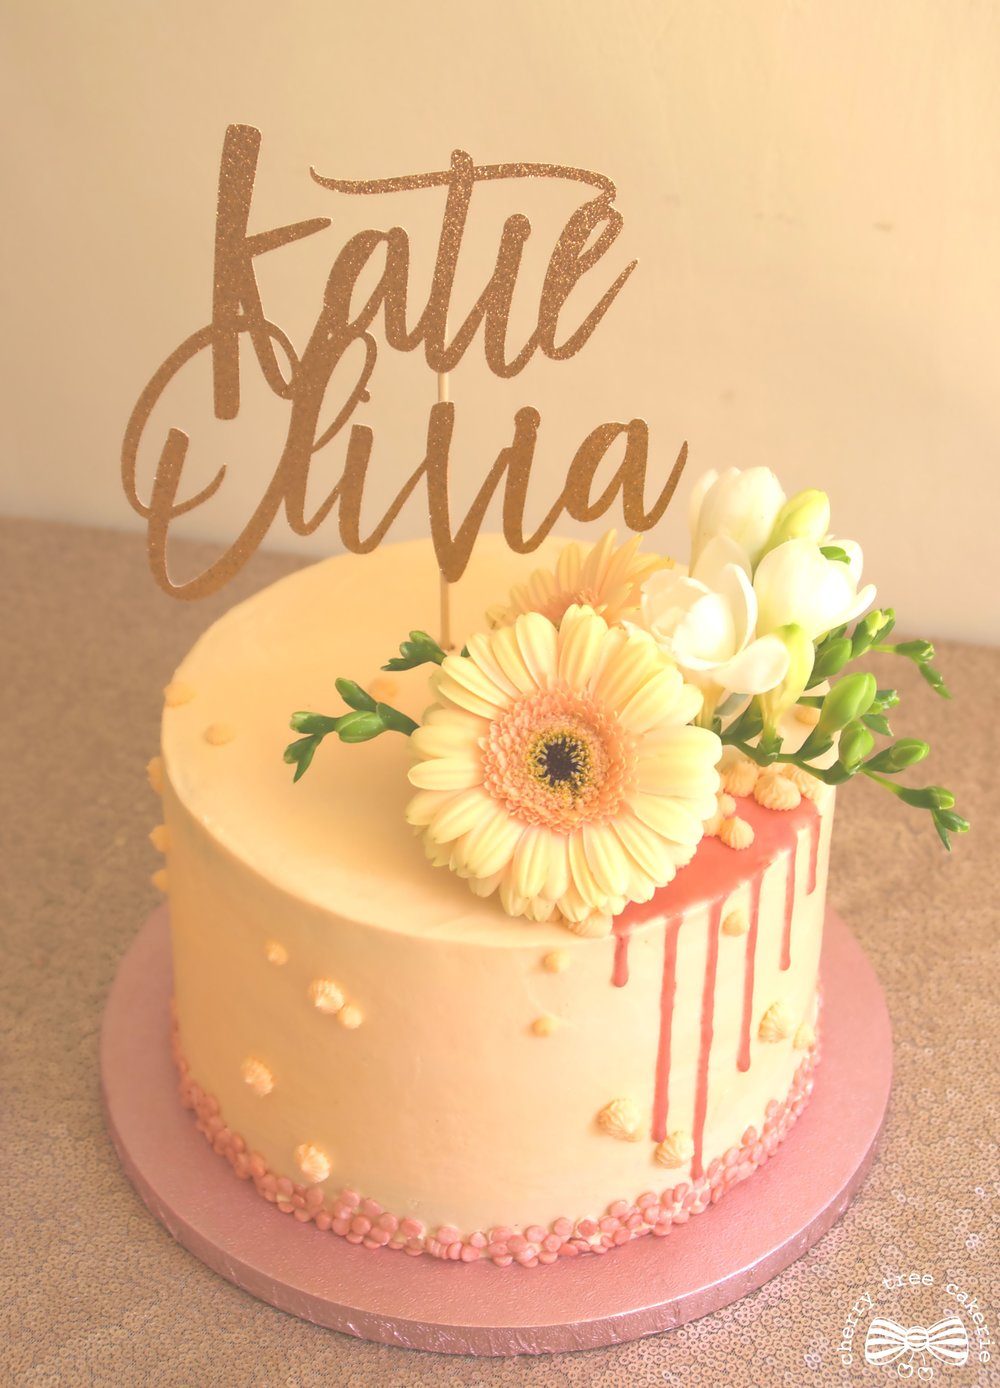 Peach and rose gold drip cake.jpg